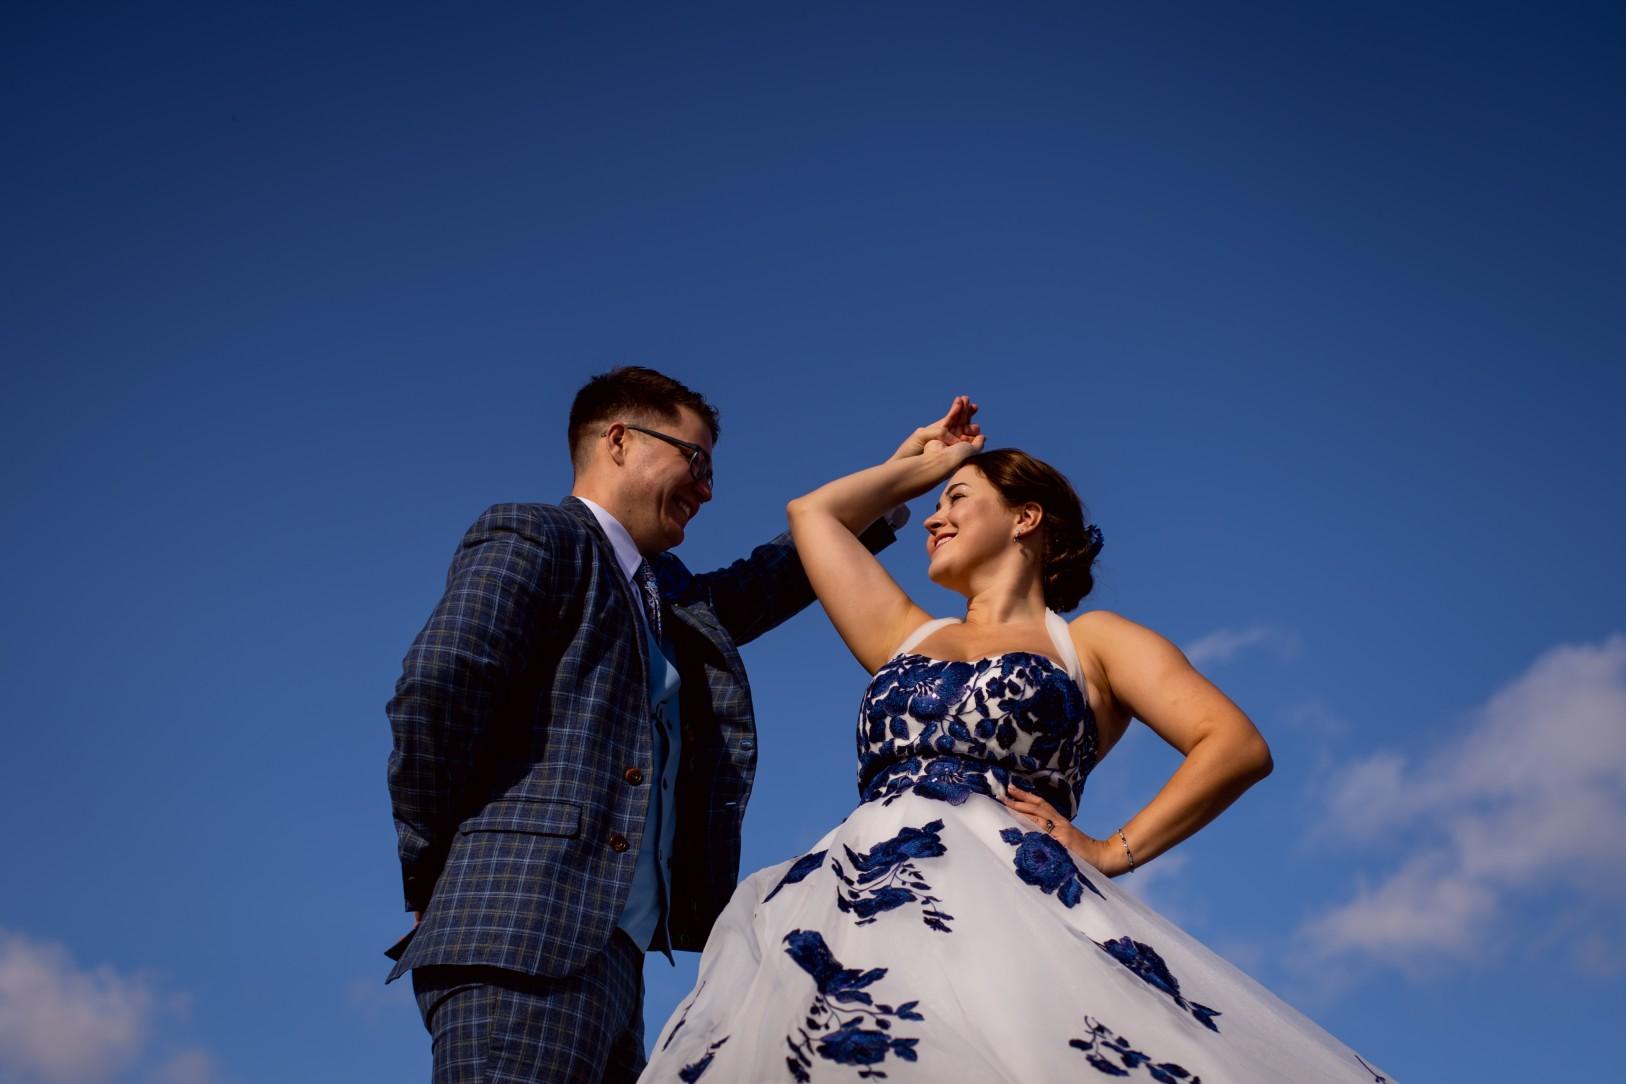 alternative wedding photography - creative wedding photography - artistic wedding photography - unique wedding wear